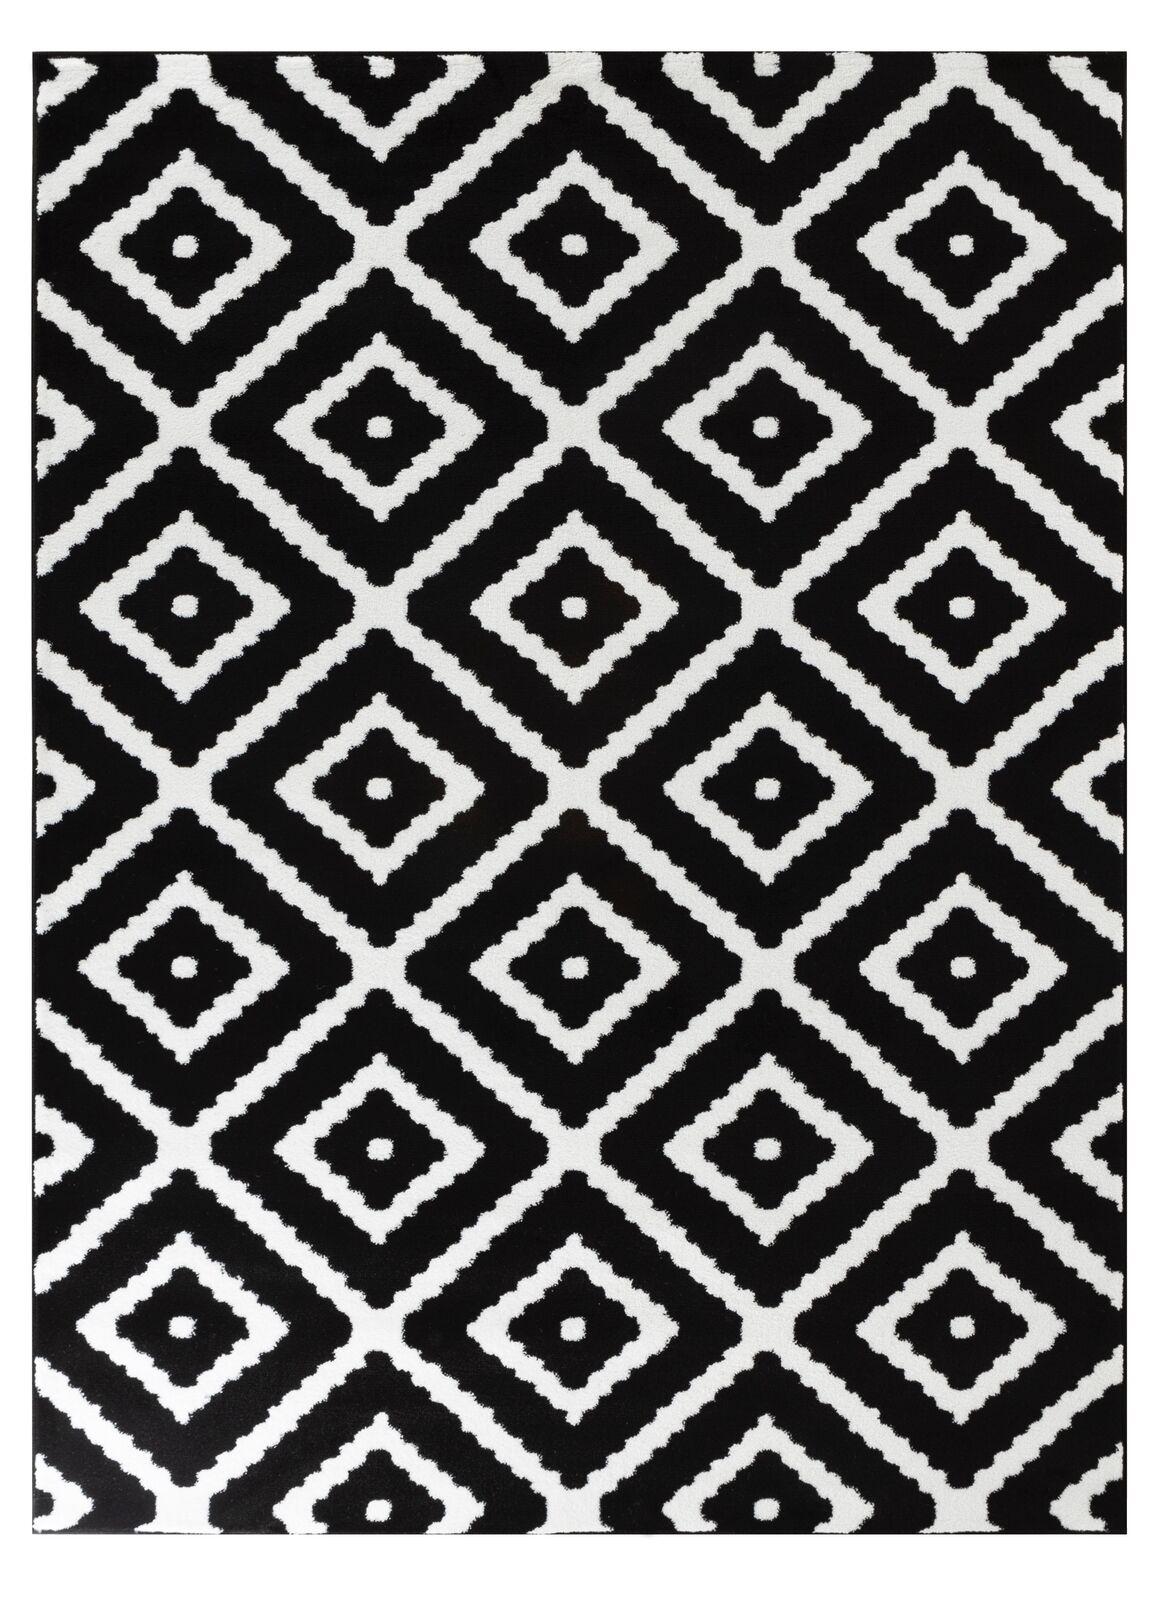 Summit 46 Black White Diamond Area Rug Modern Abstract Rug 5x8